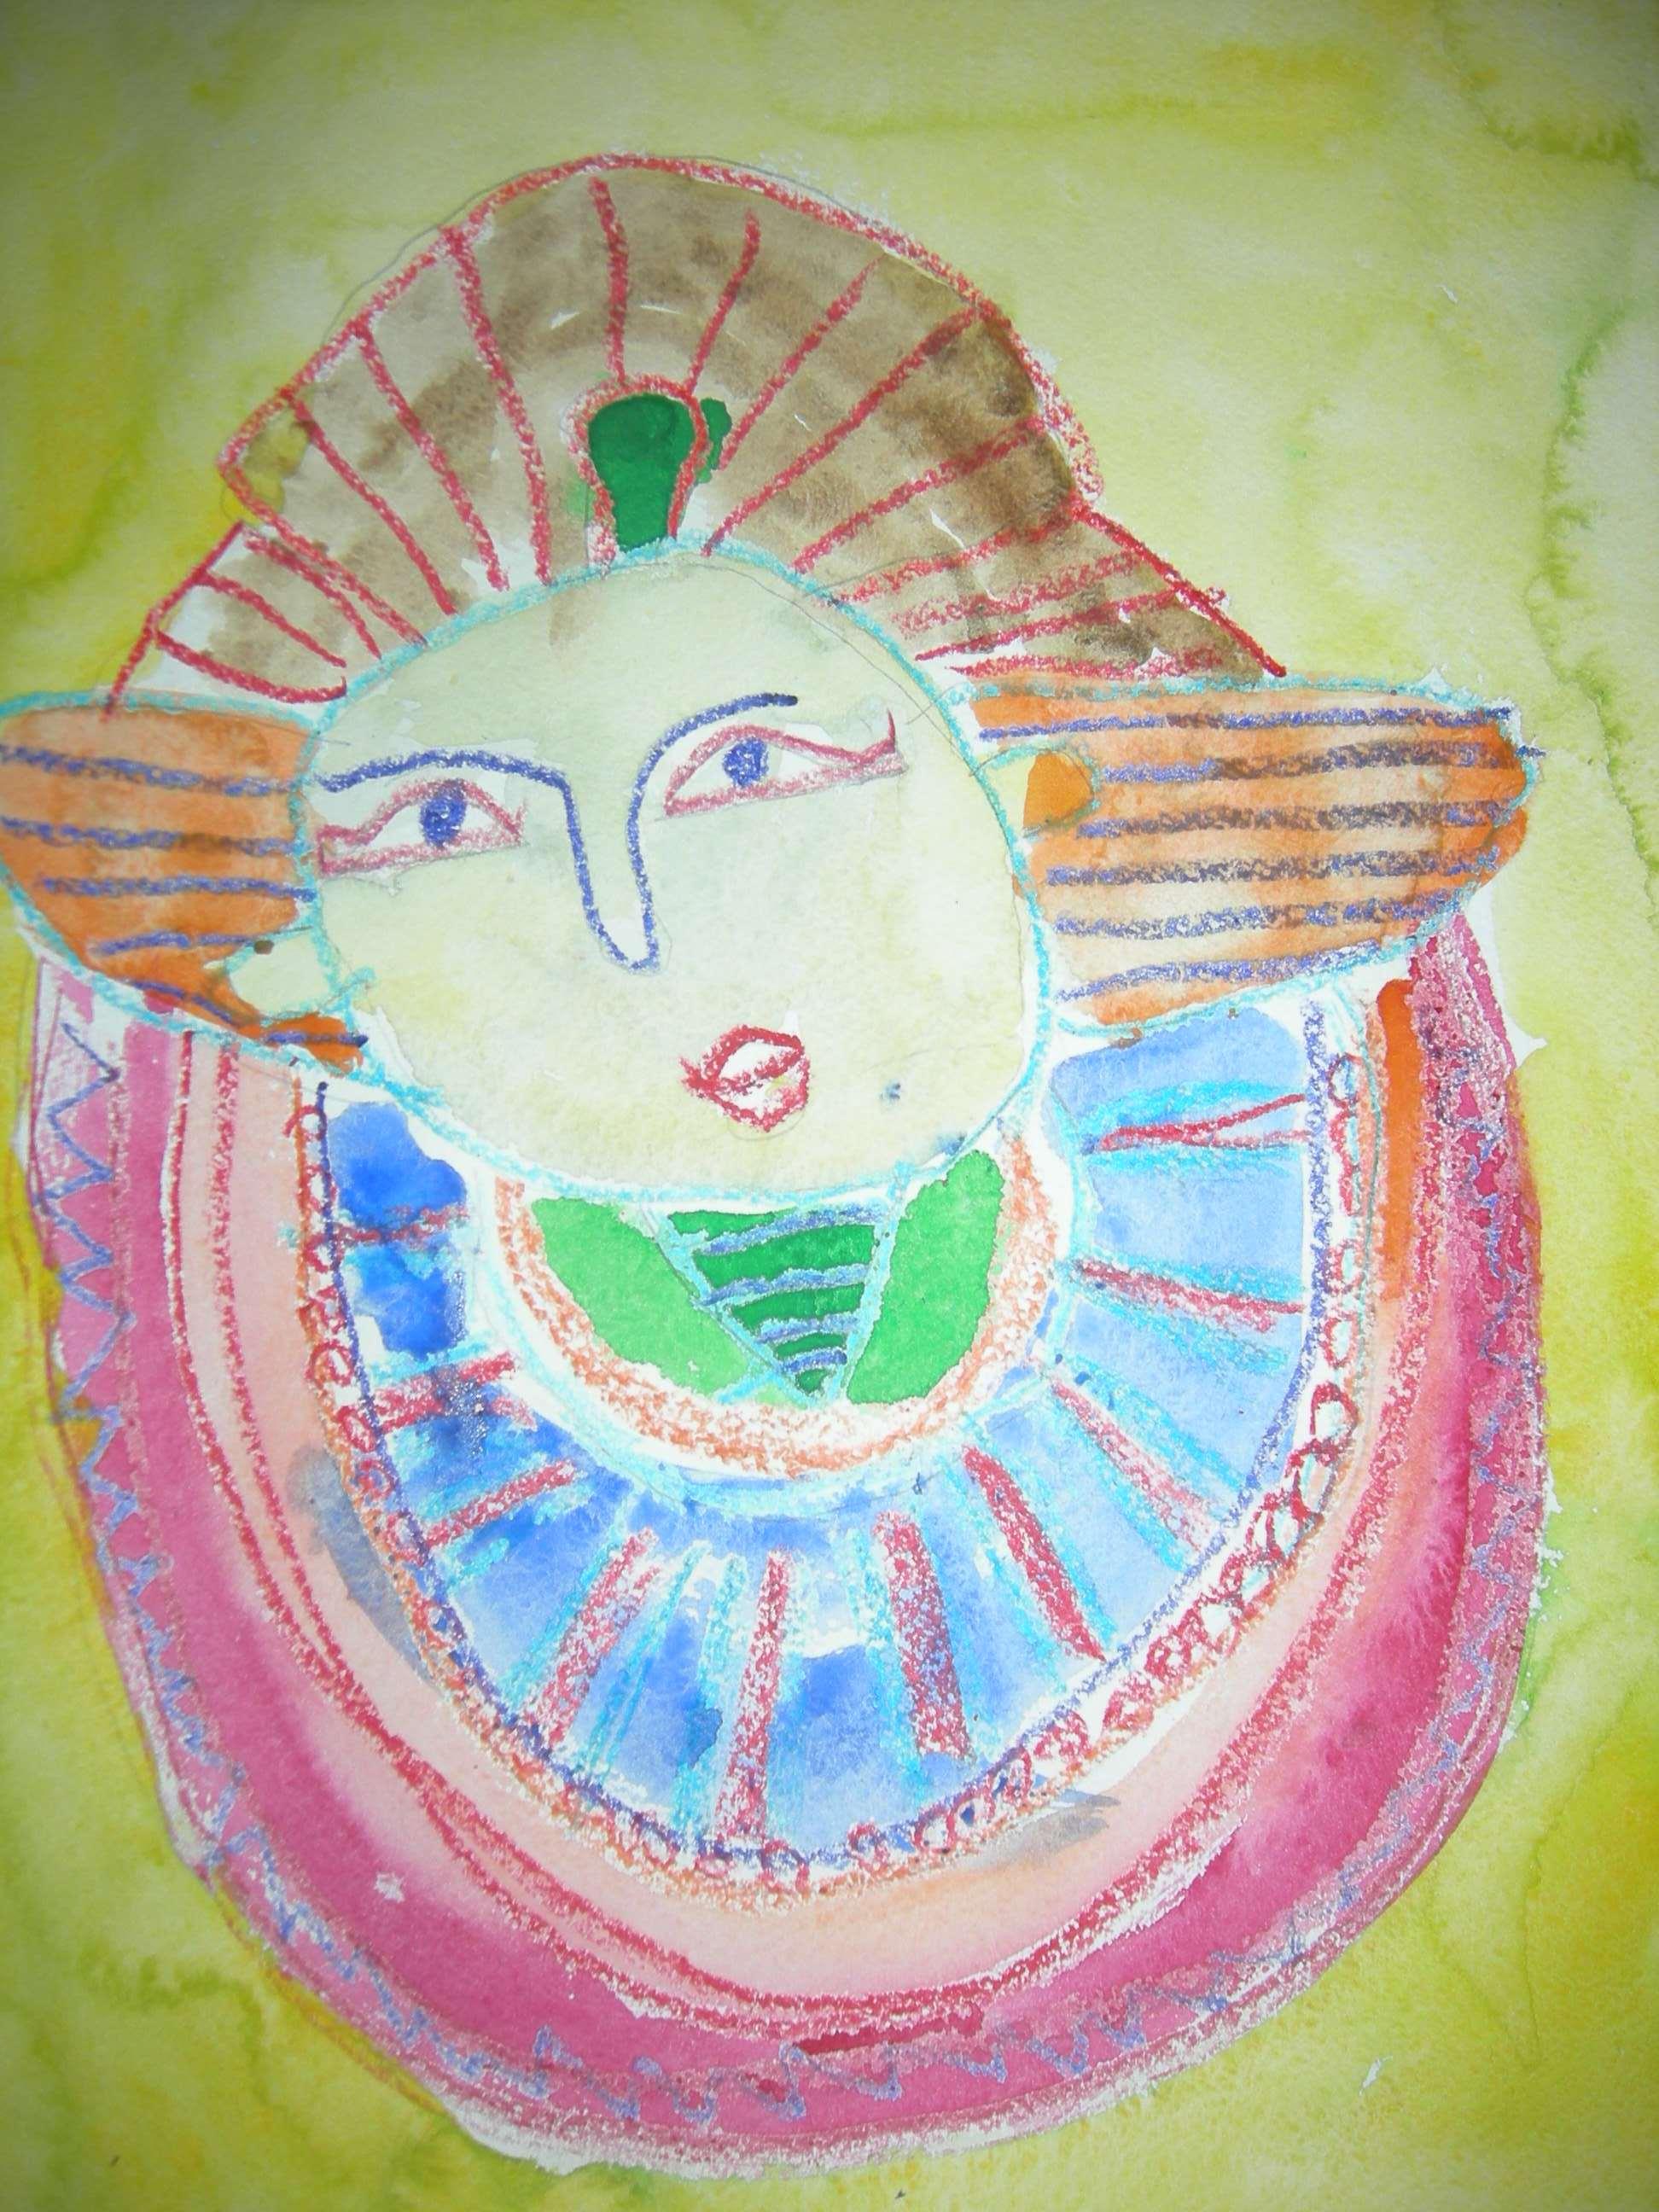 Царица Клеопатра!. Конкурс детского рисунка с ВООБРАЖАЛКИНЫМ